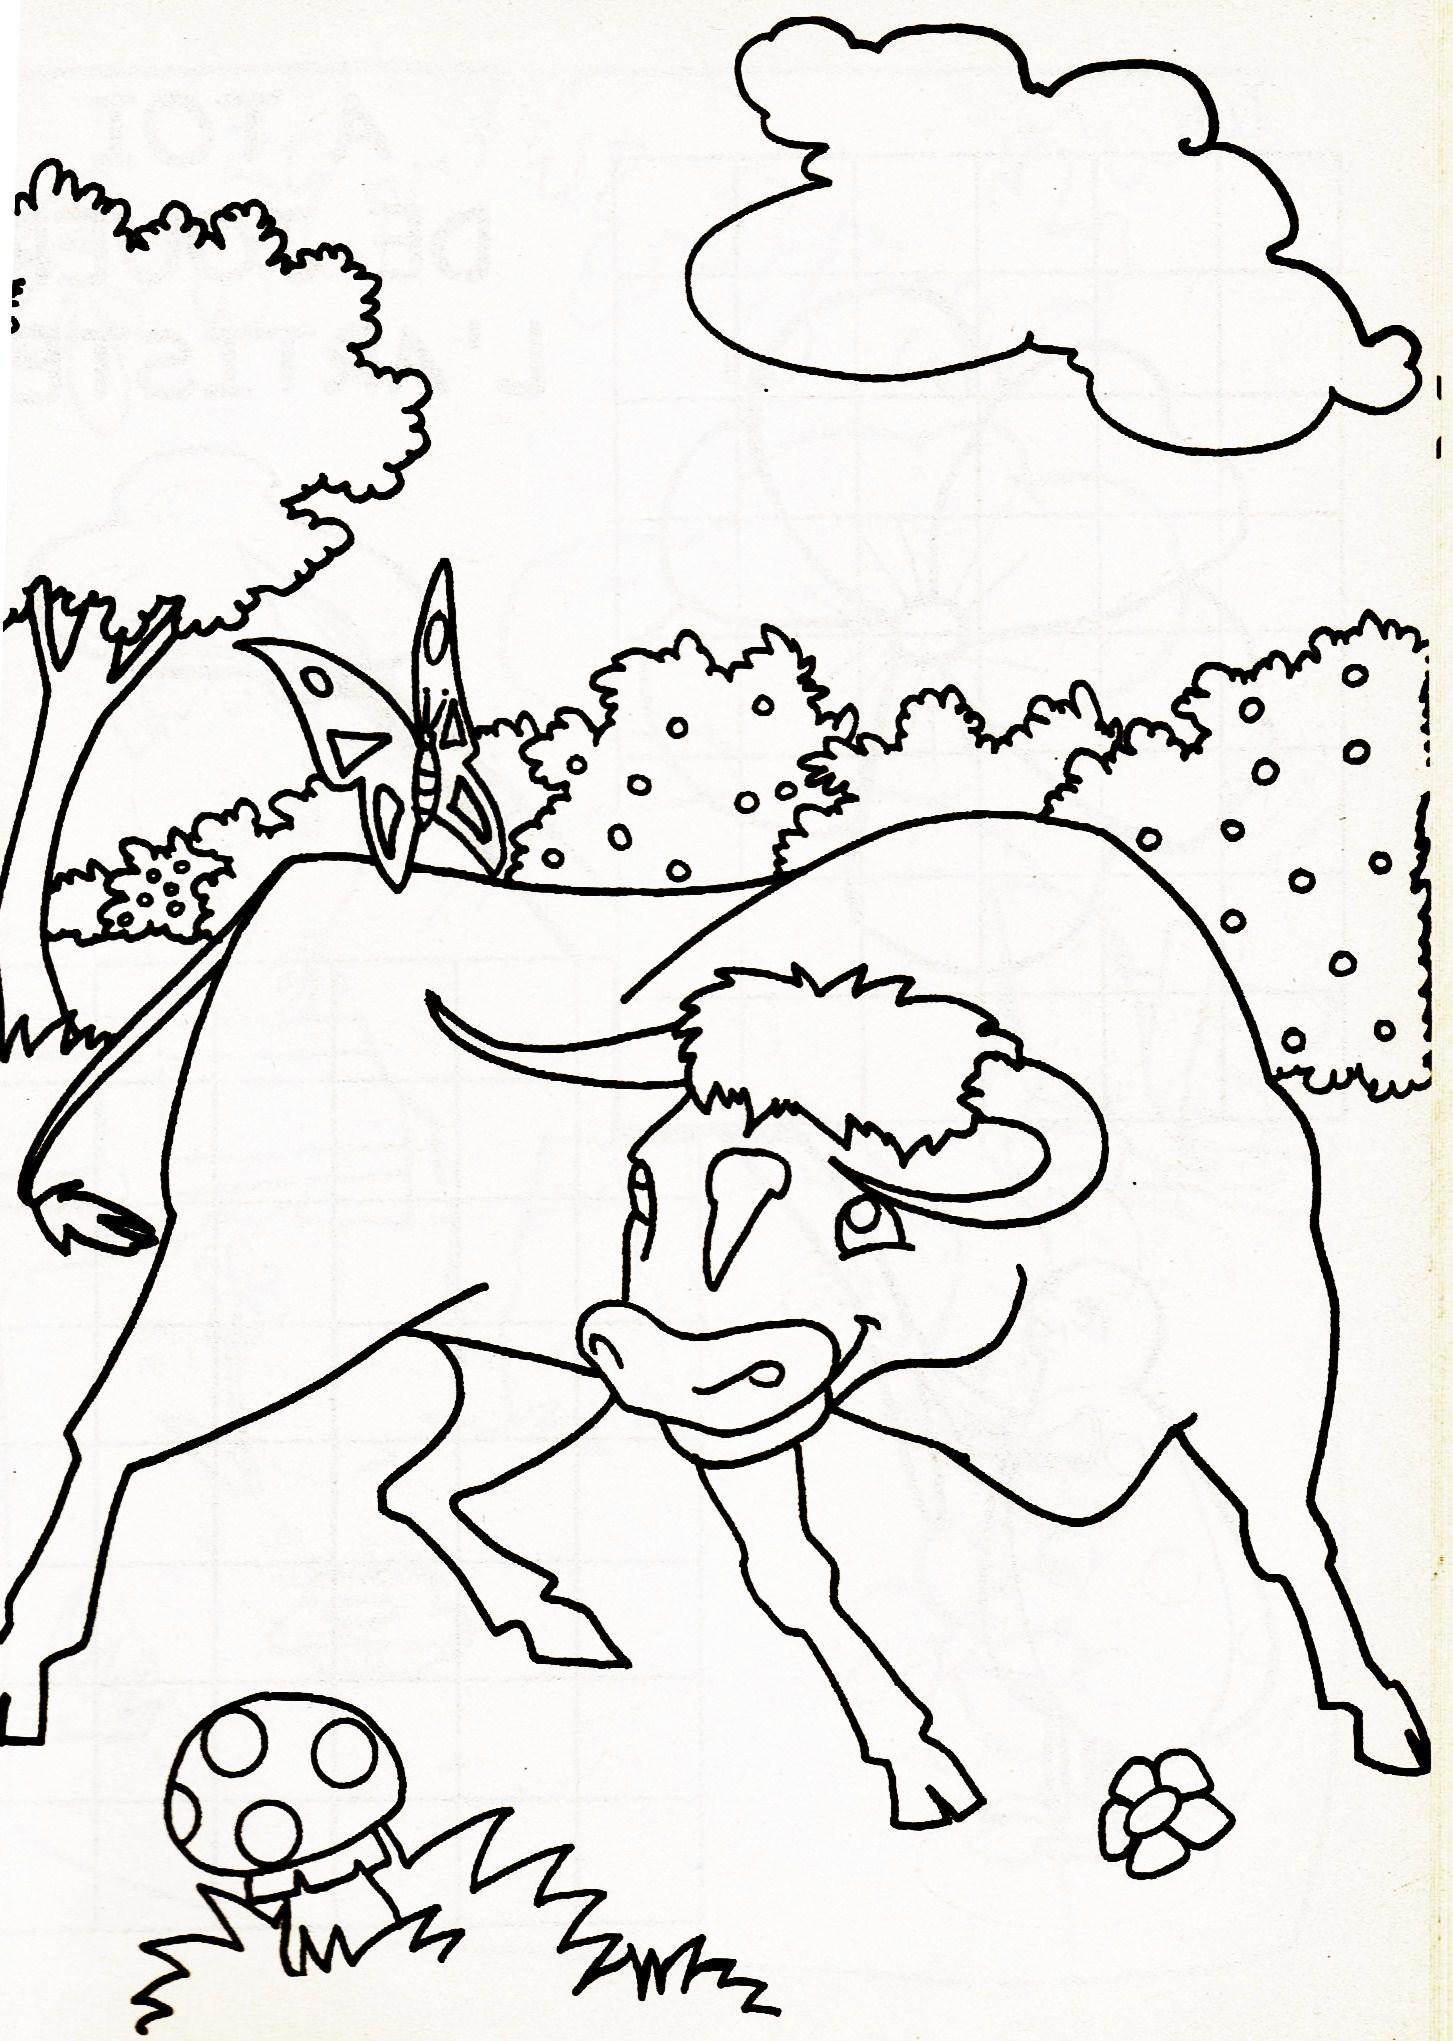 Taureau 4 - Dessin de toro ...